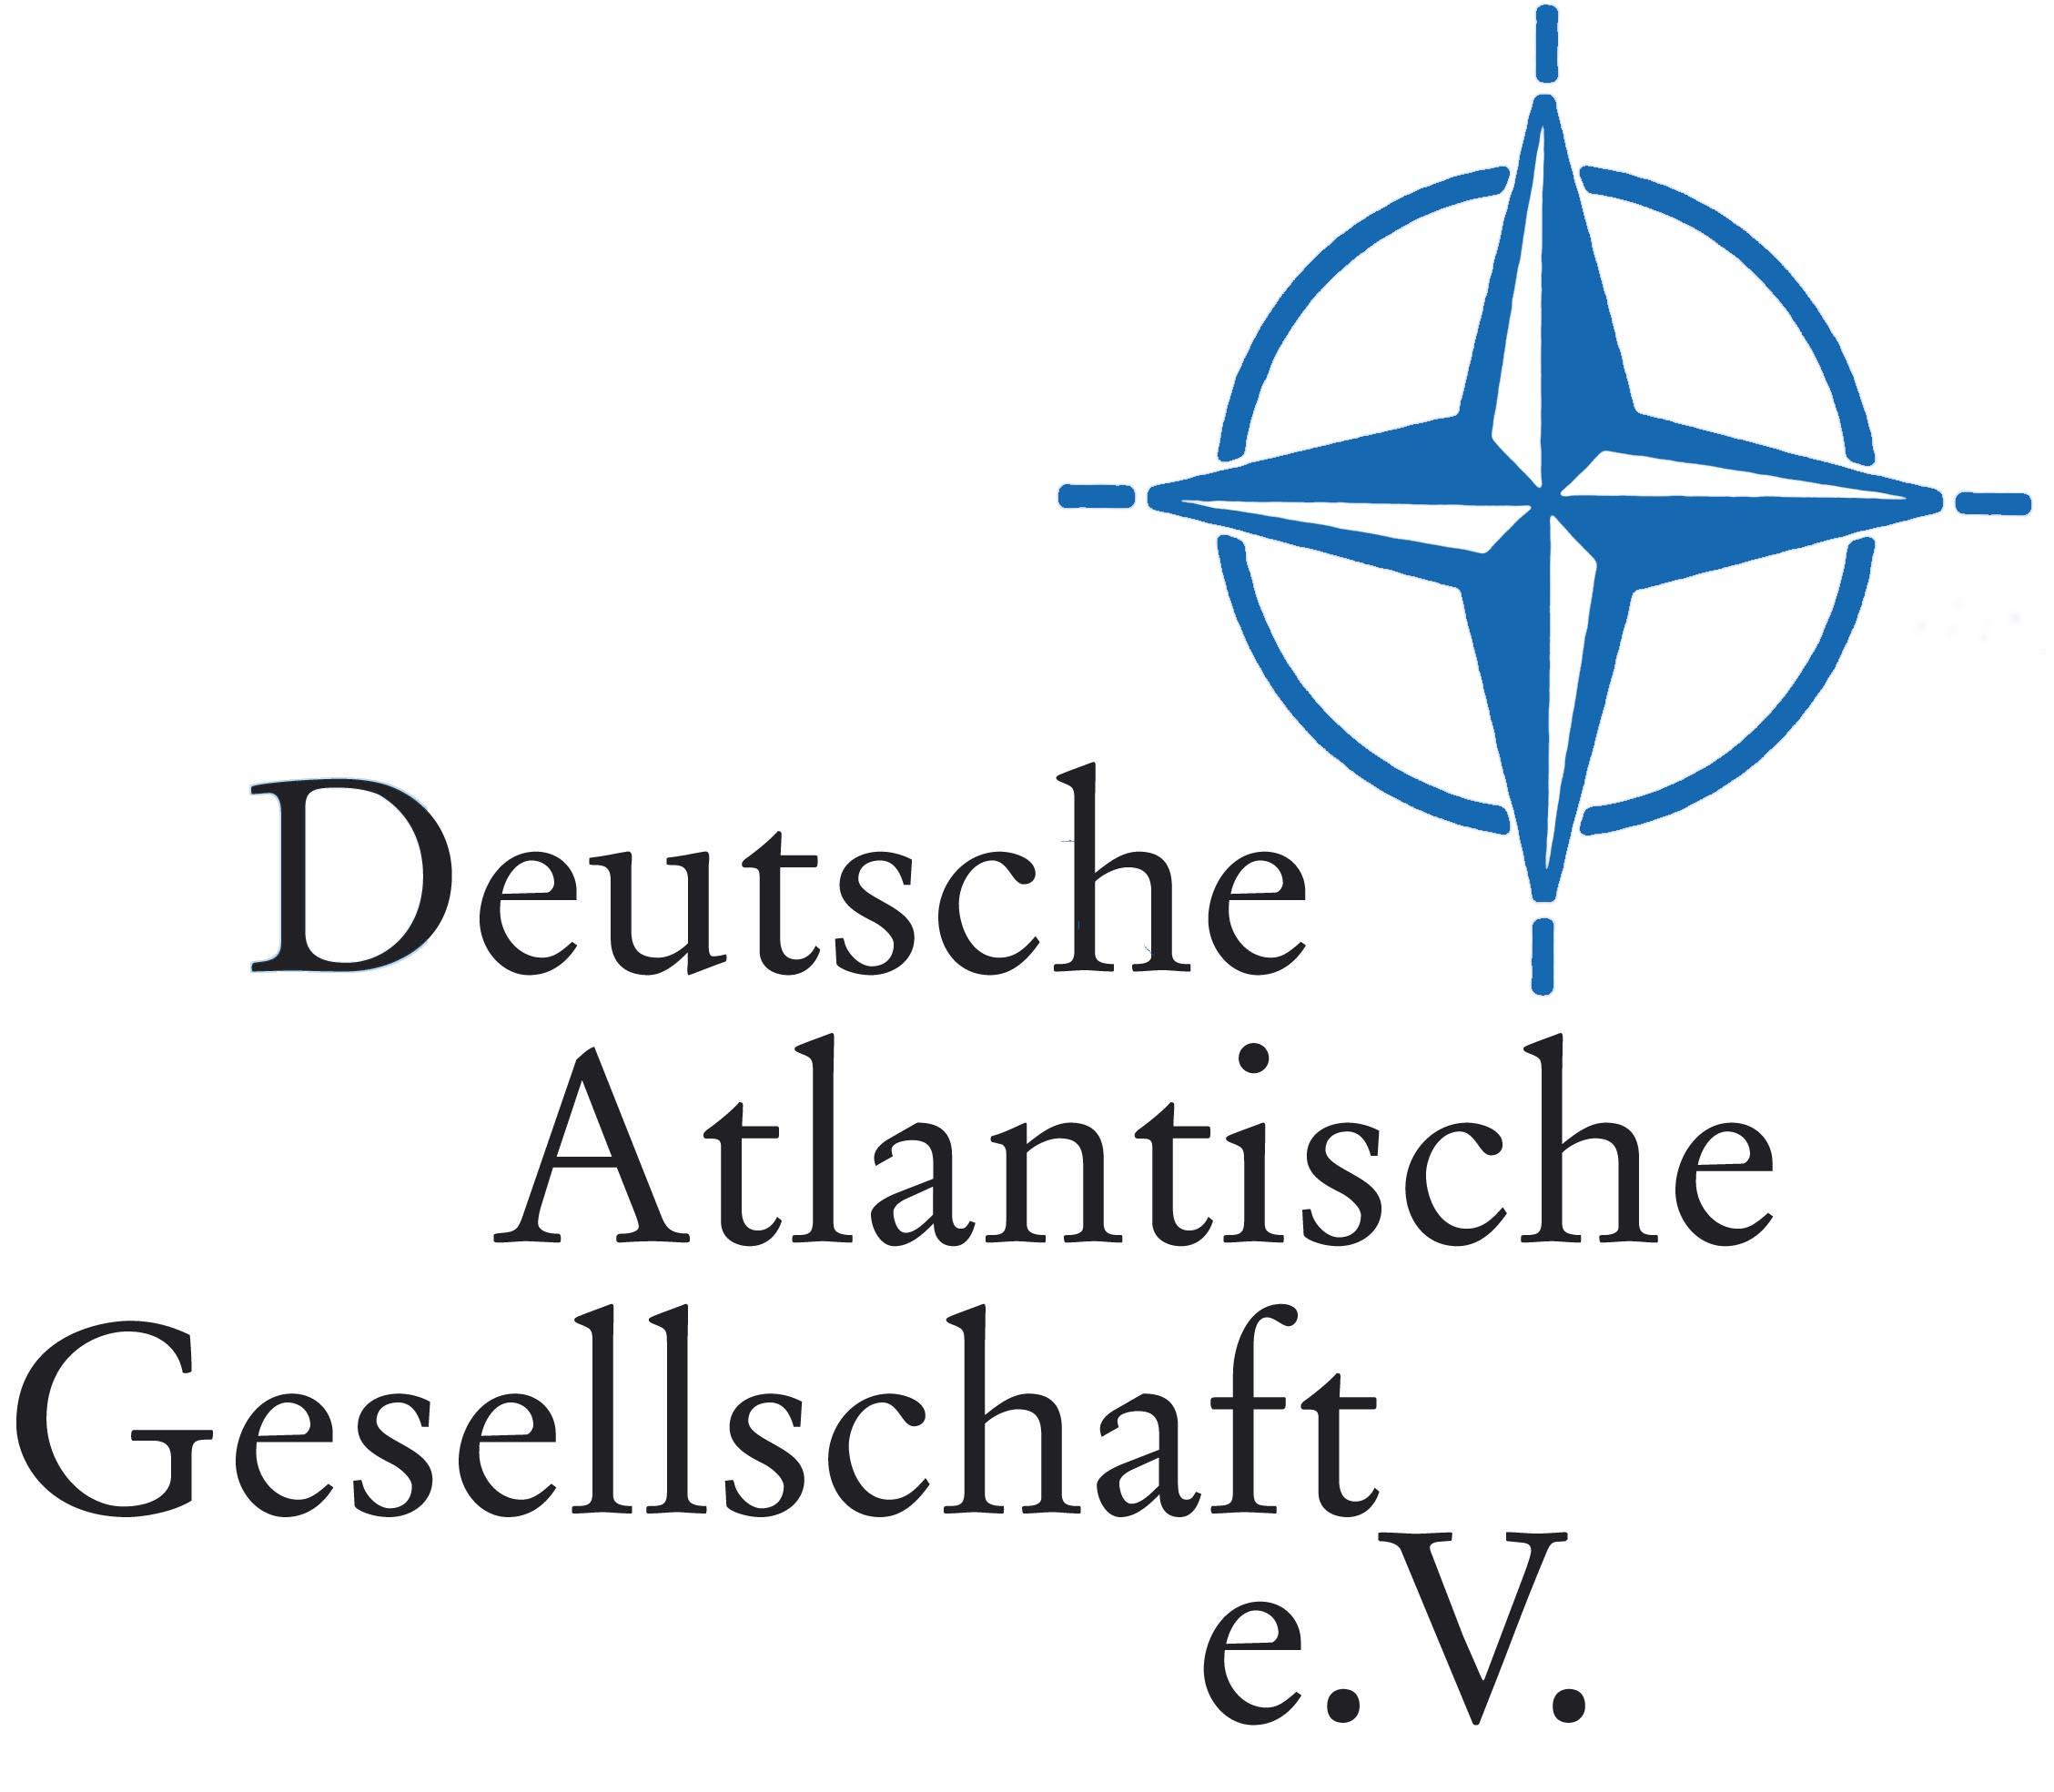 logo for Deutsche Atlantische Gesellschaft